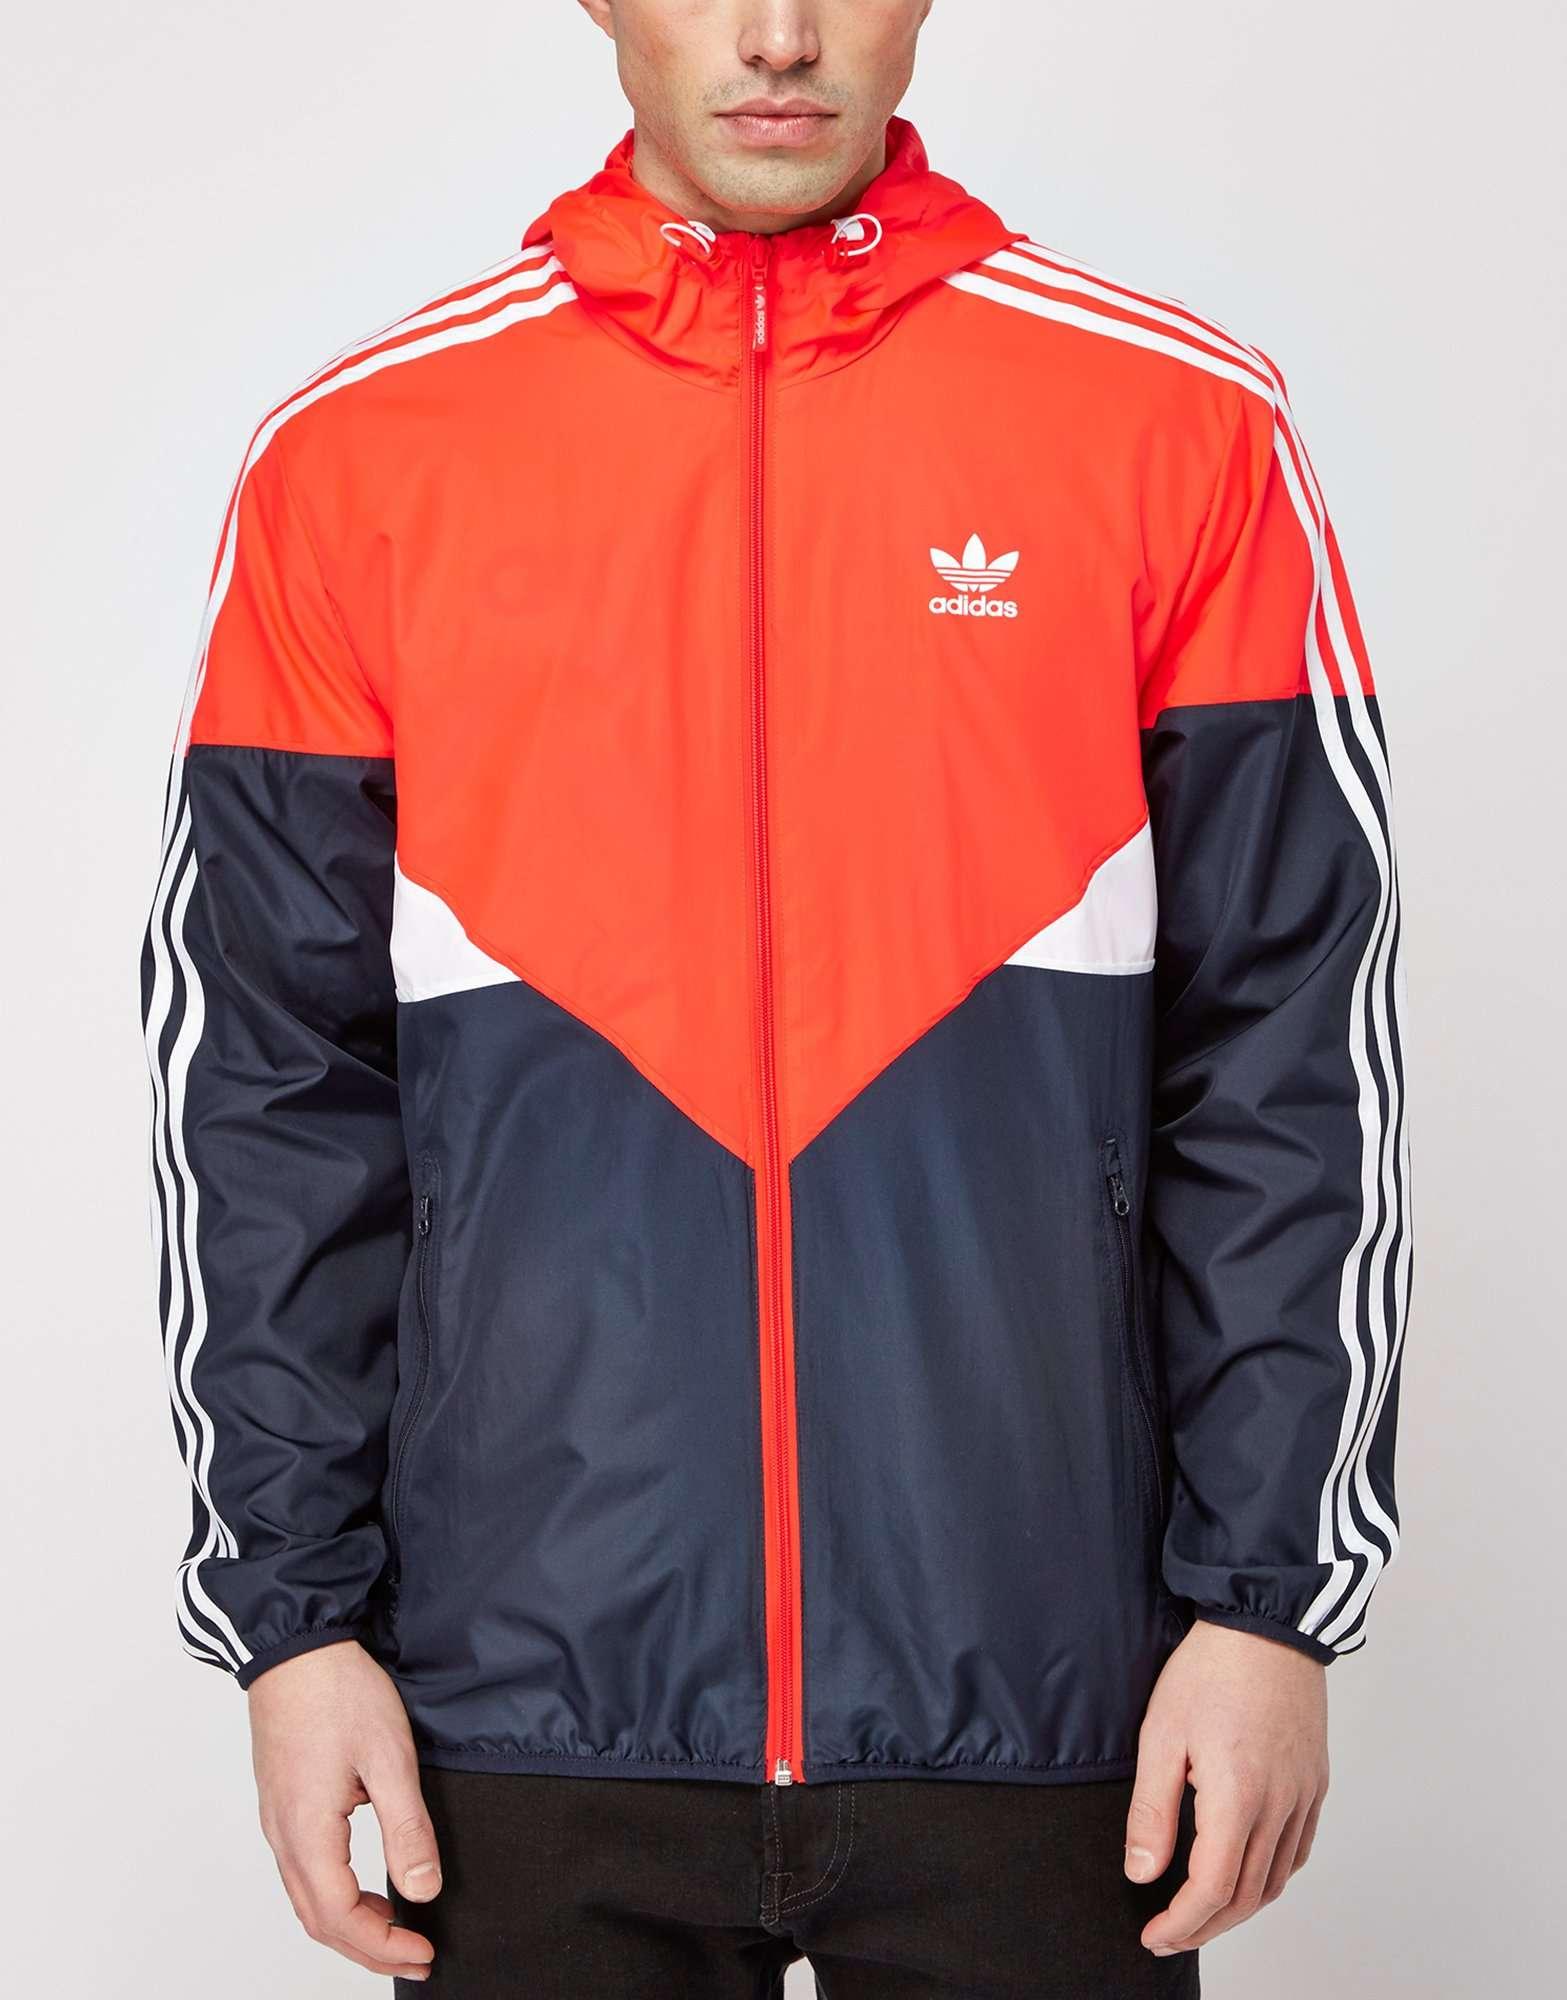 c4ce8865d Scotts Menswear Jacket Adidas Originals Colorado HXnTqwznf